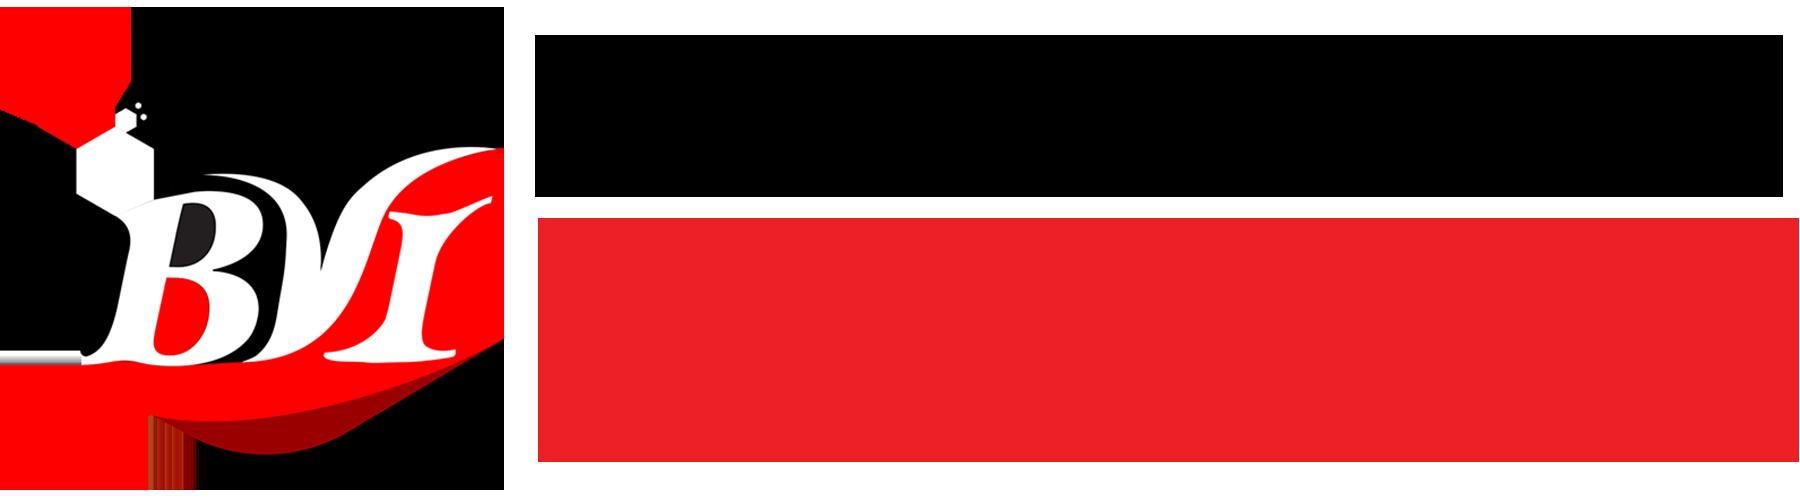 Logo He Thong Truong Bach Viet 1800 1